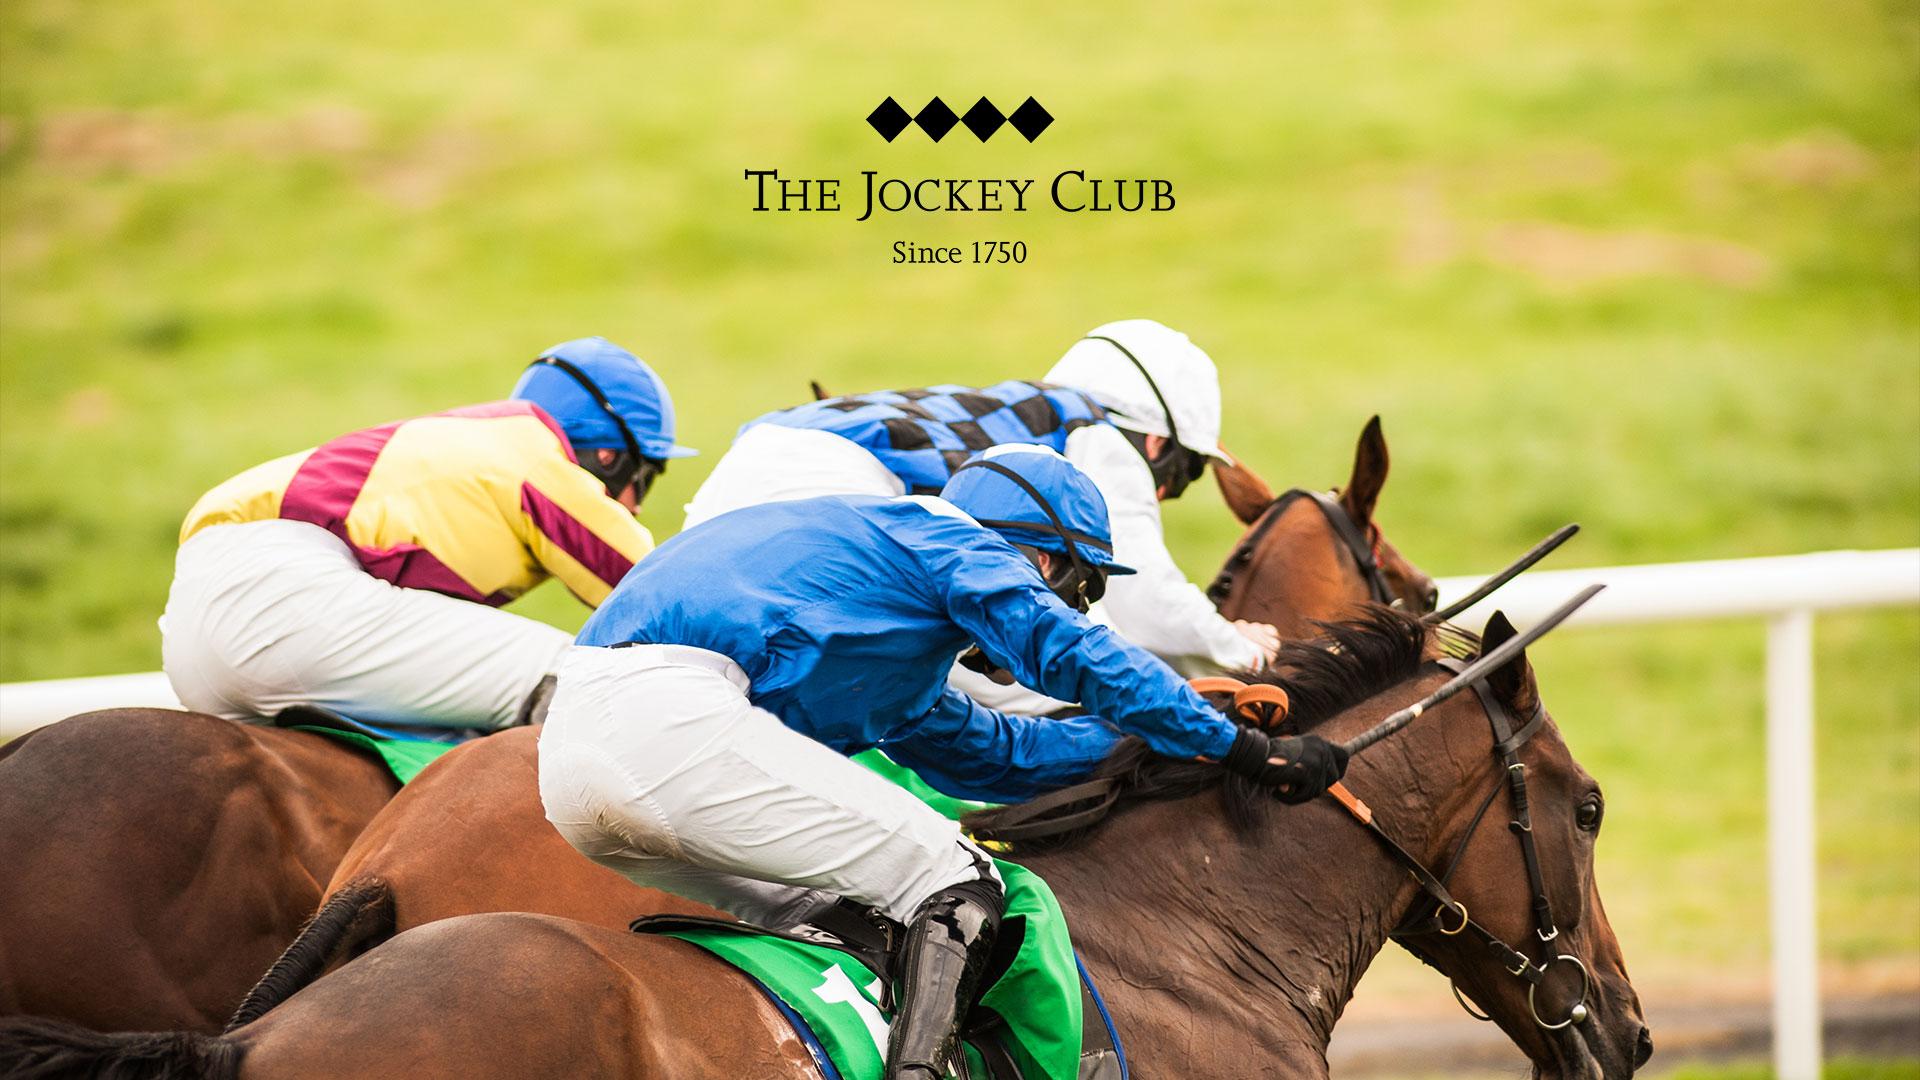 The Jockey Club since 1750